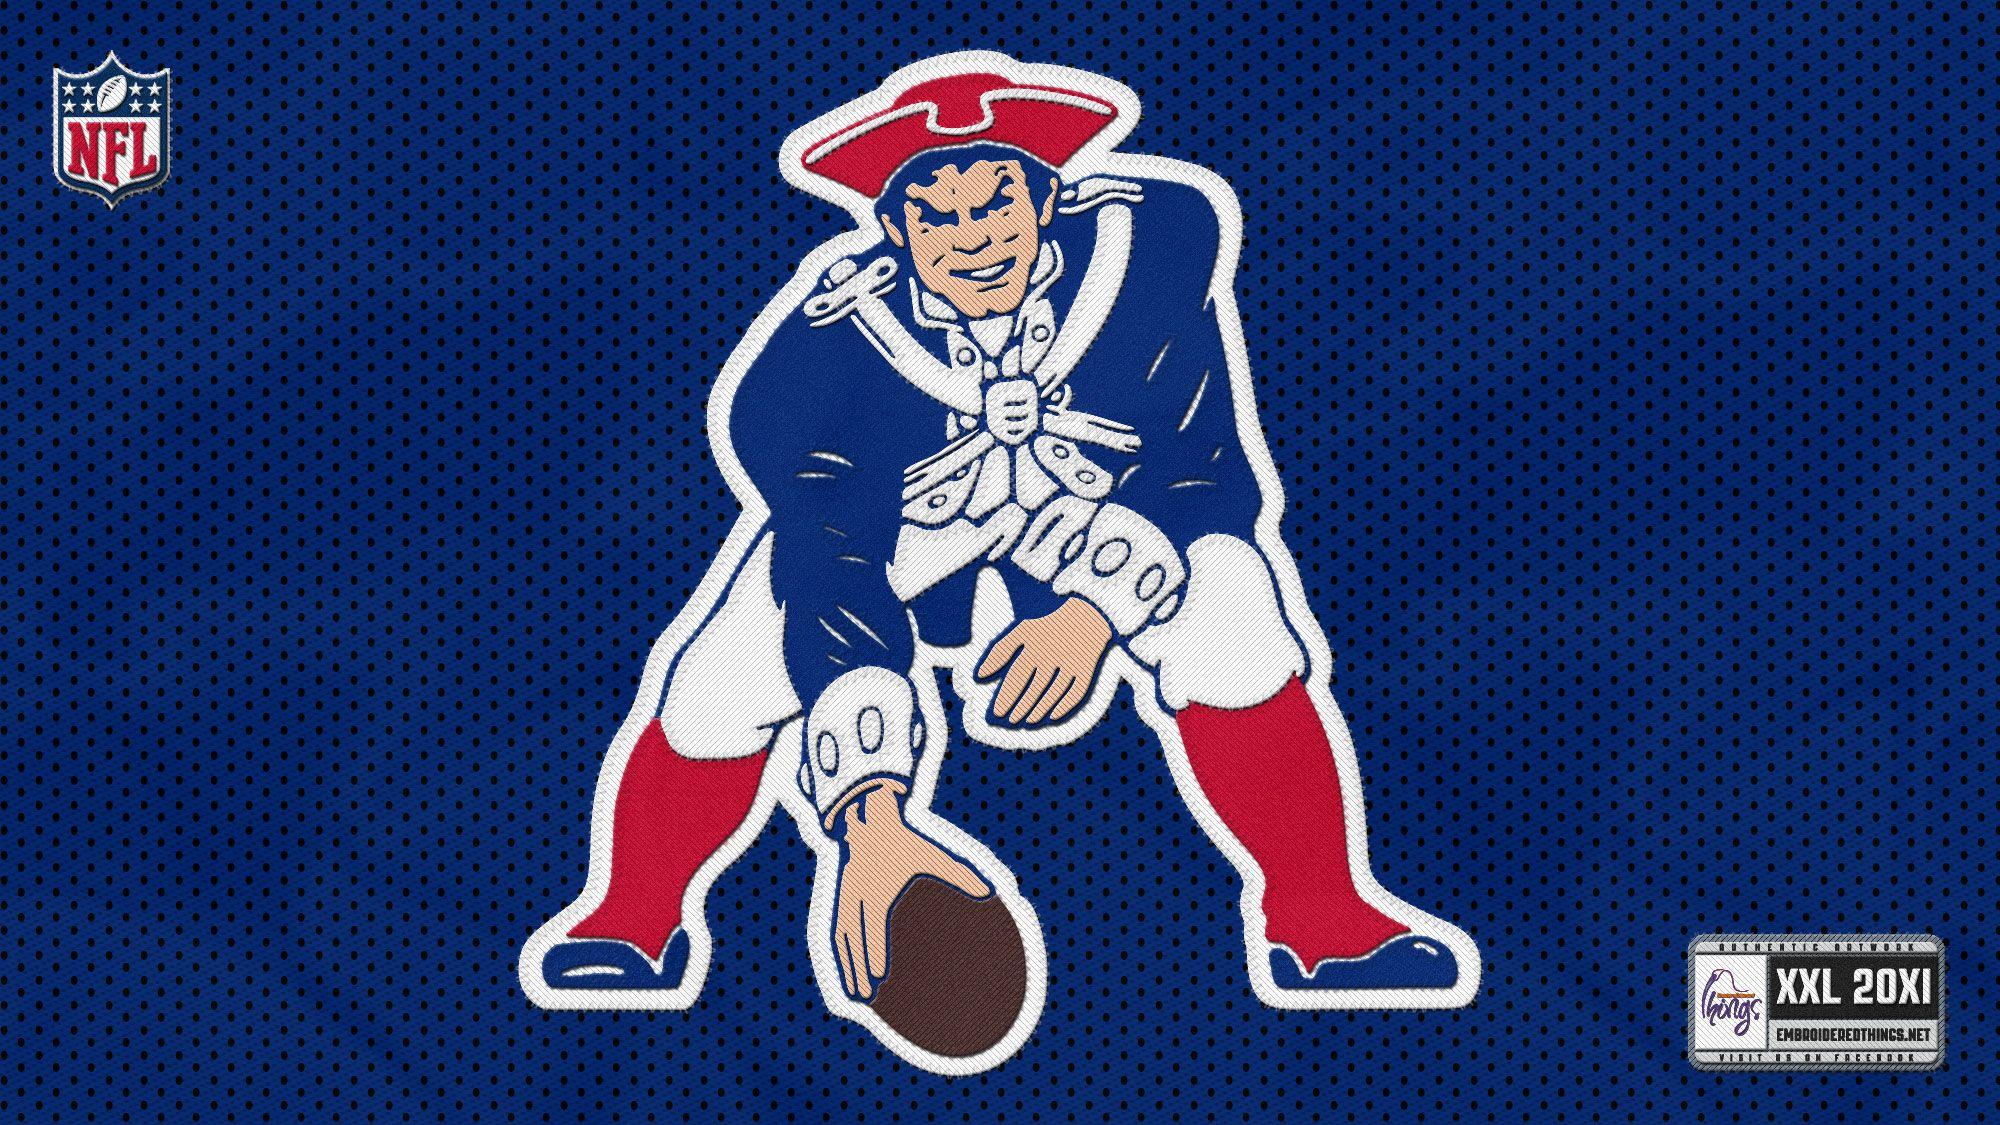 New England Patriots Wallpaper New England Patriots Wallpaper New England Patriots Gear New England Patriots Images